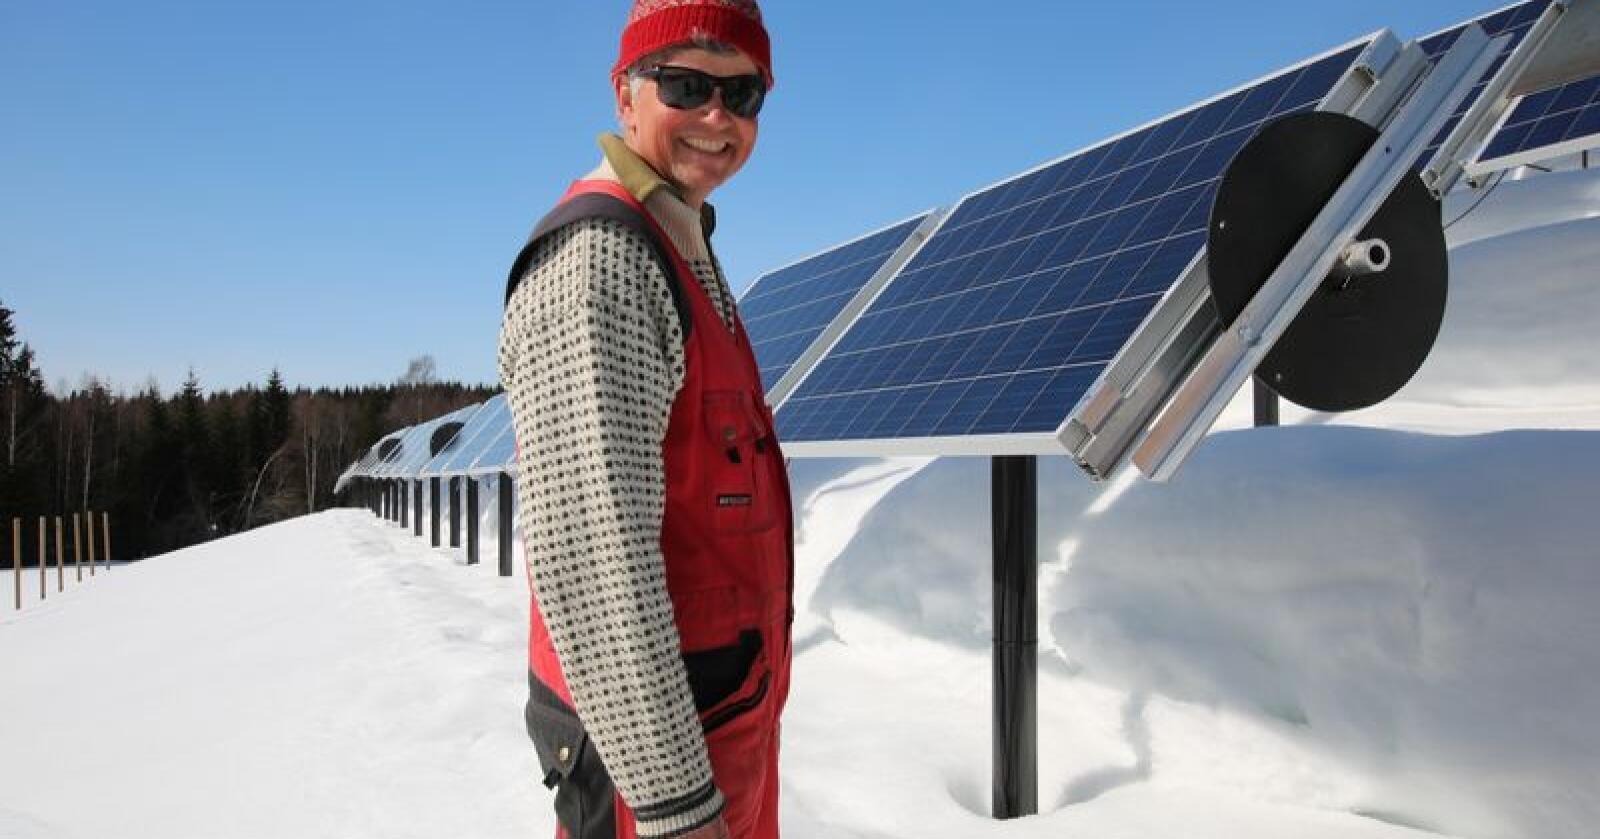 Med 94 solcellepaneler på jordet, er solbærdyrker Helge Hvoslef nesten selvforsynt med strøm. Foto: Camilla Mellemstrand